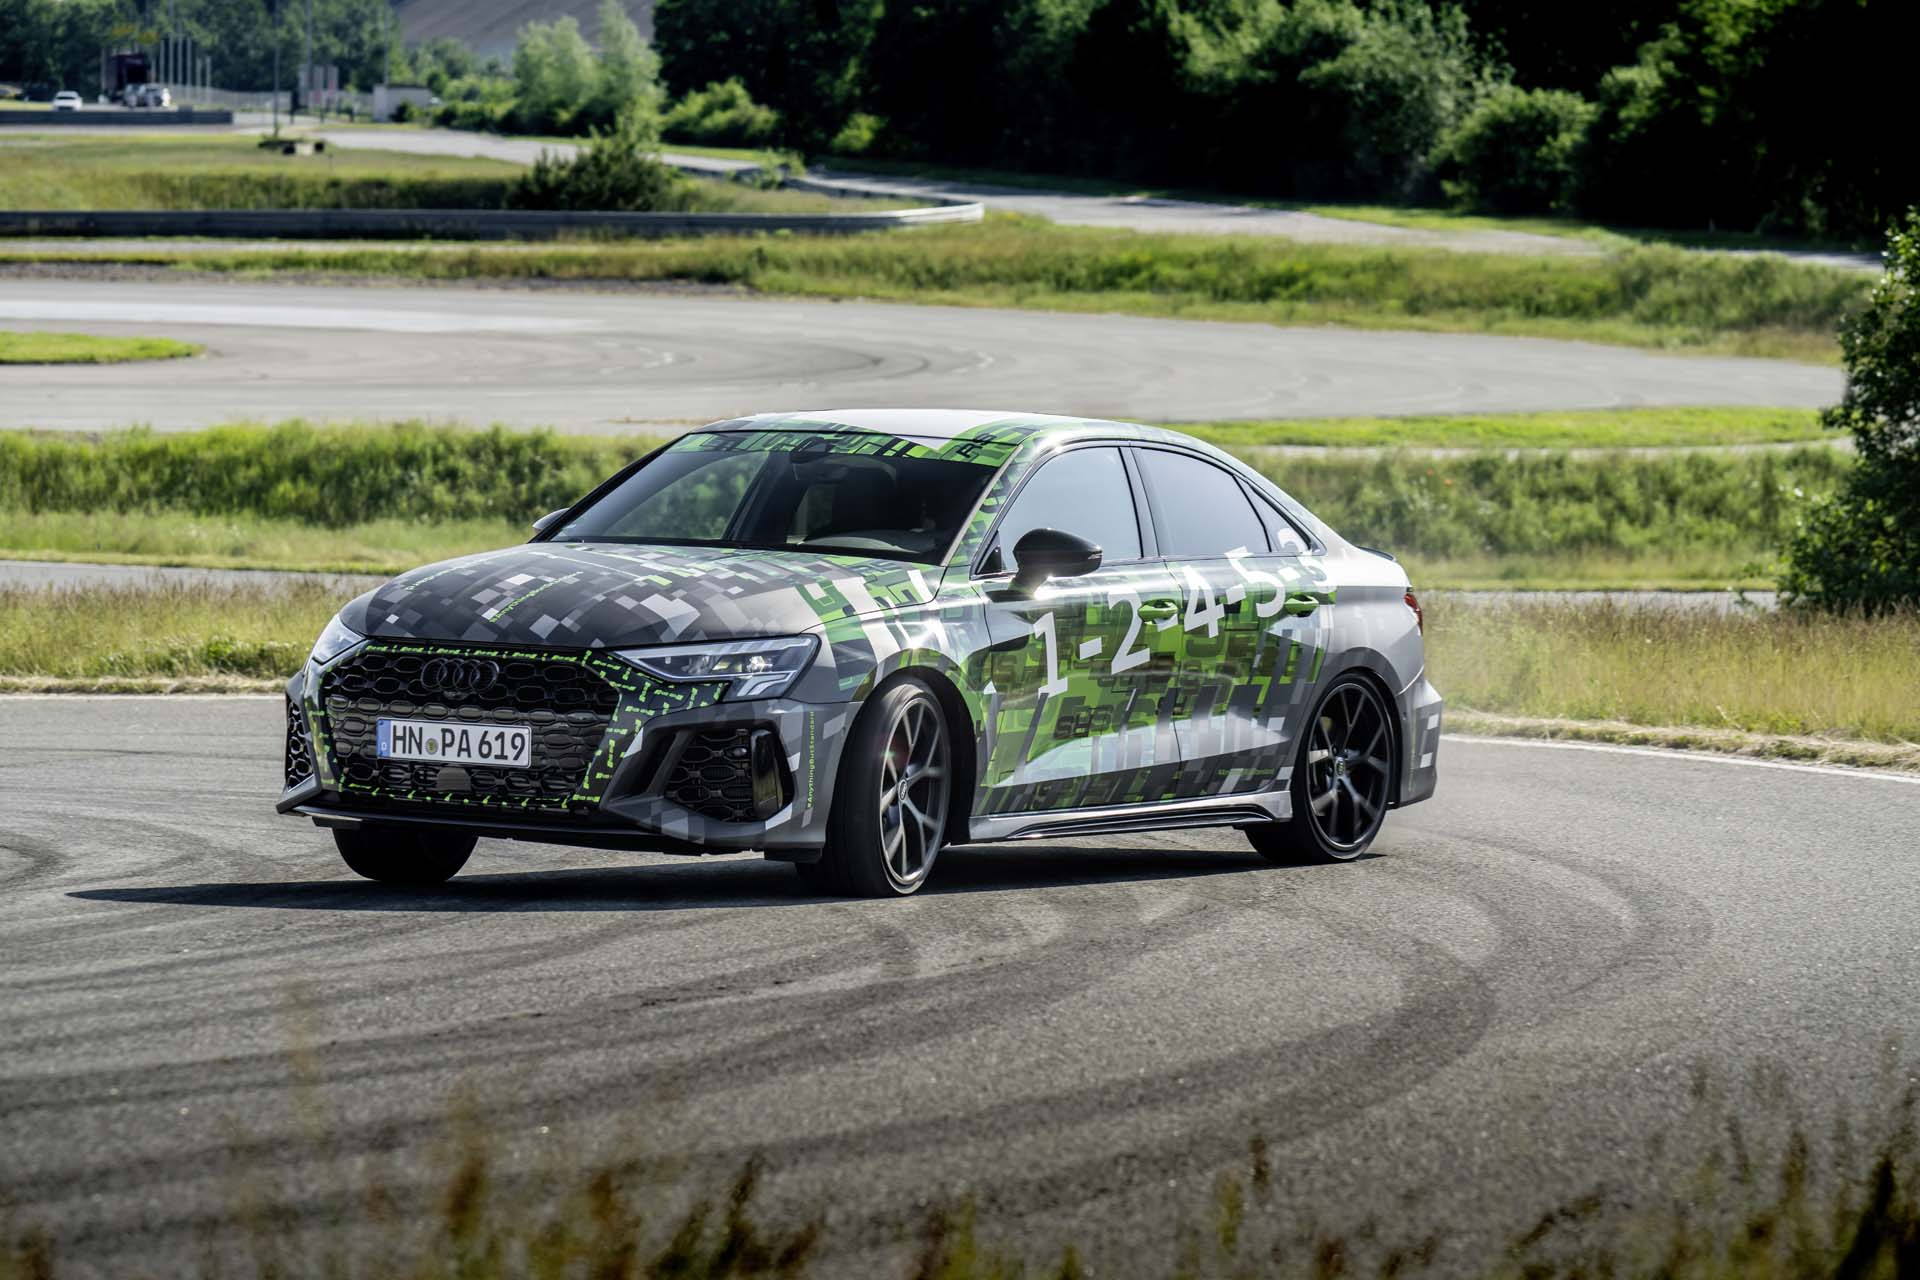 Sneak preview: 2022 Audi RS 3 to add rear torque splitter, hit 62 mph in 3.8 seconds